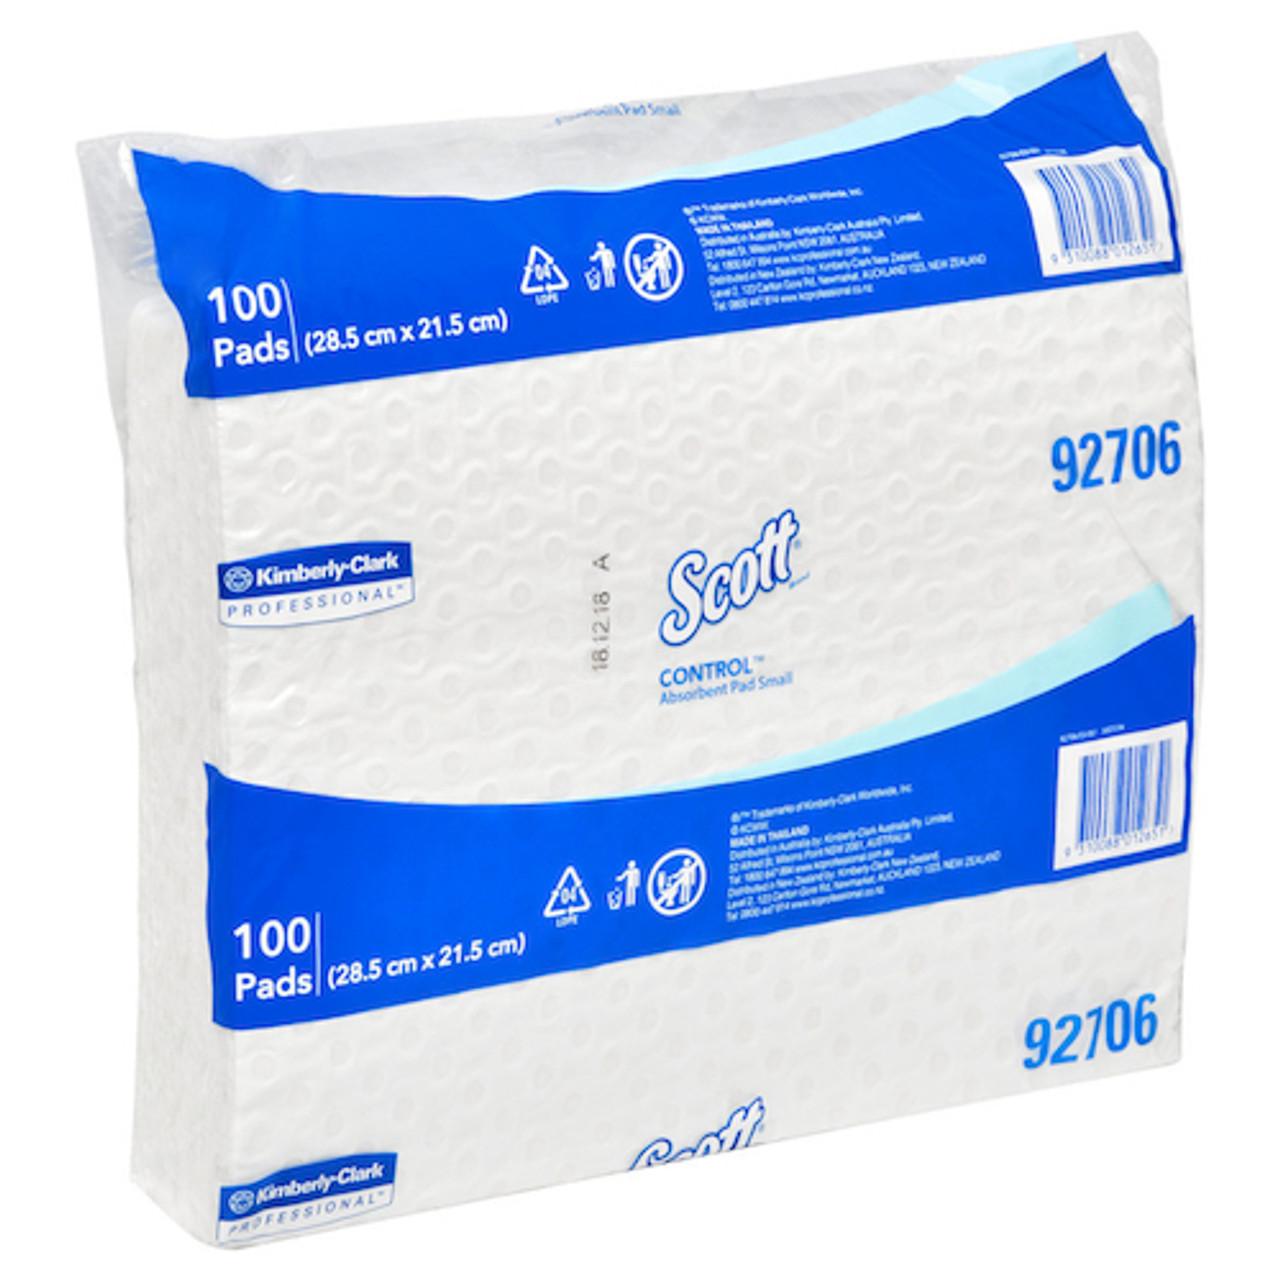 Scott Control Small Absorbent Pads 28.5cm x 21.5cm 100 Pads (KC92706) Kimberly Clark Professional